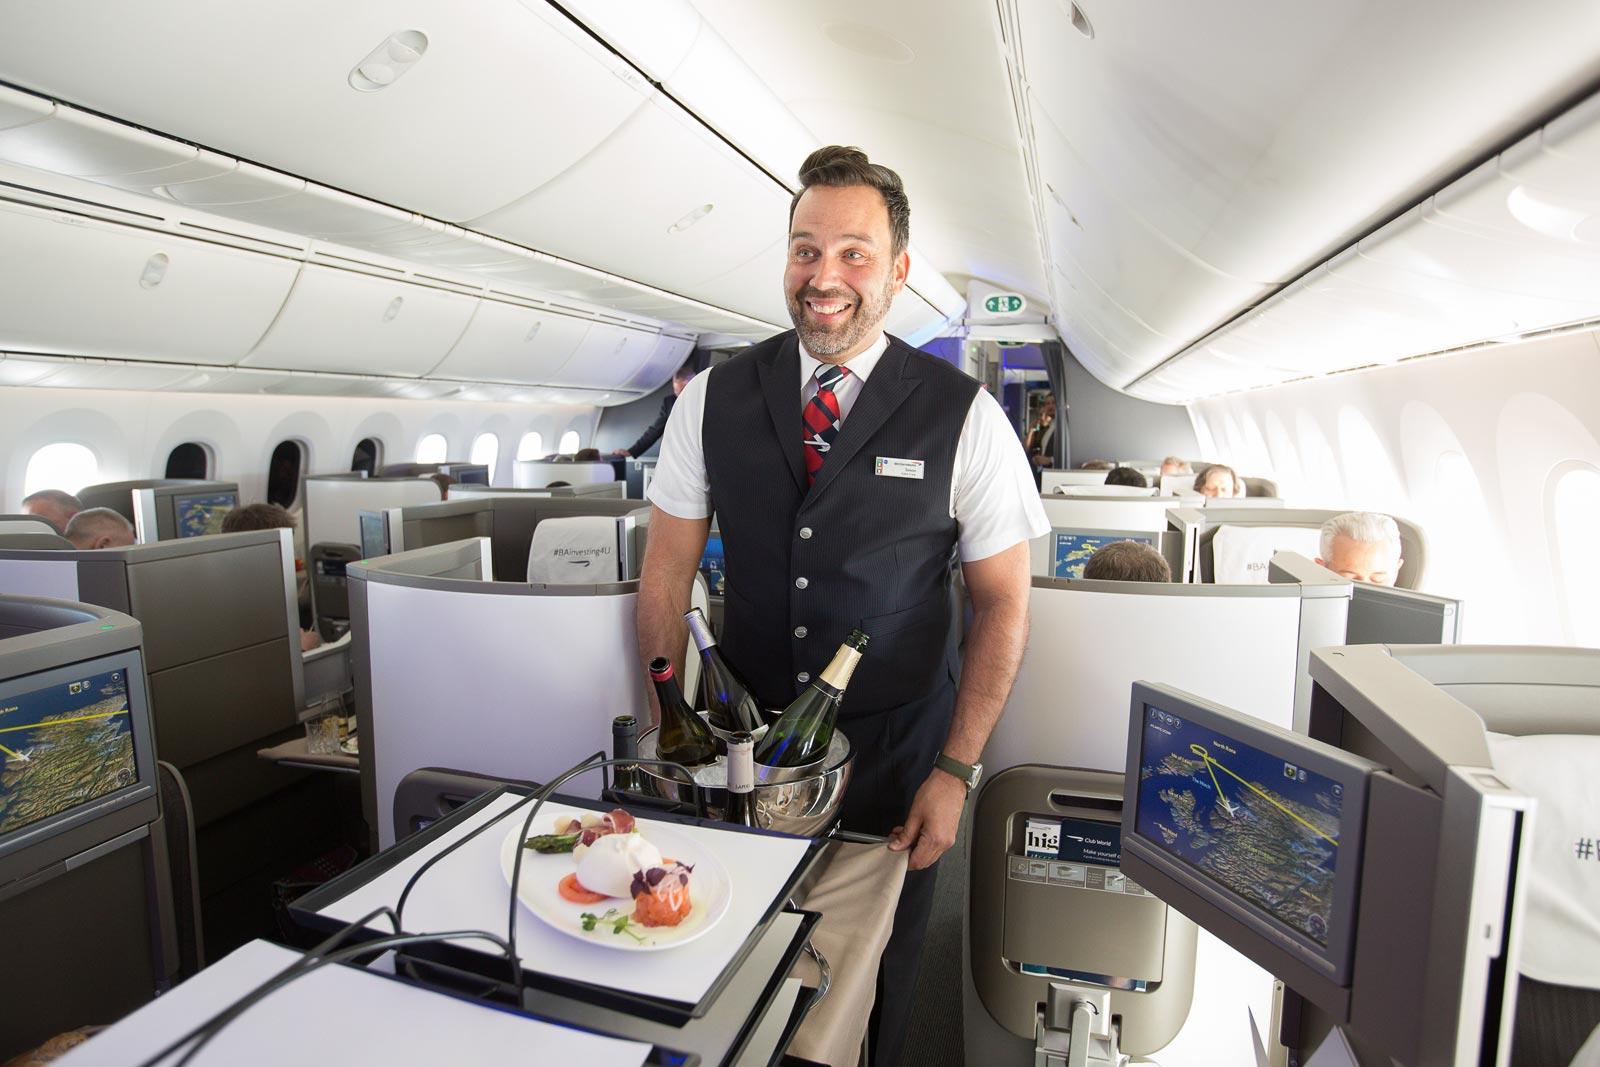 British Airways Club World - A Better Class of Business